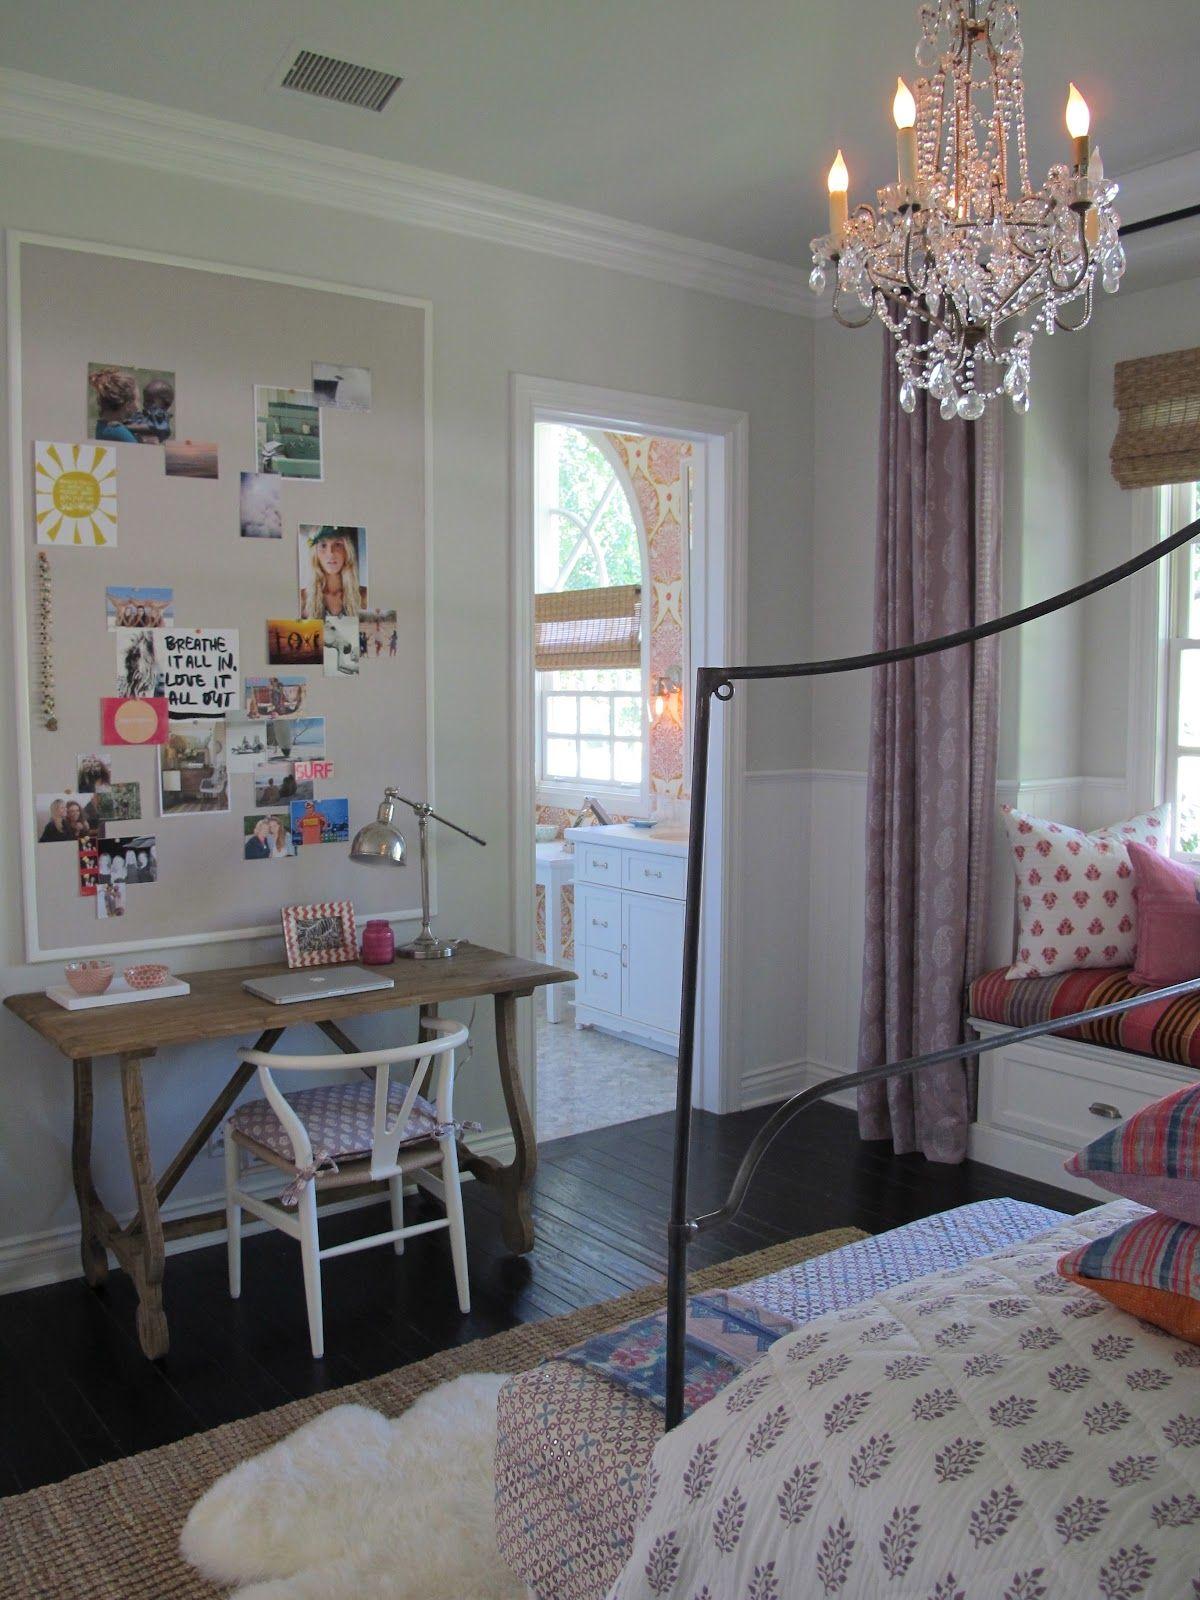 i love this the desk bedding window seat subtle color pops rh pinterest com